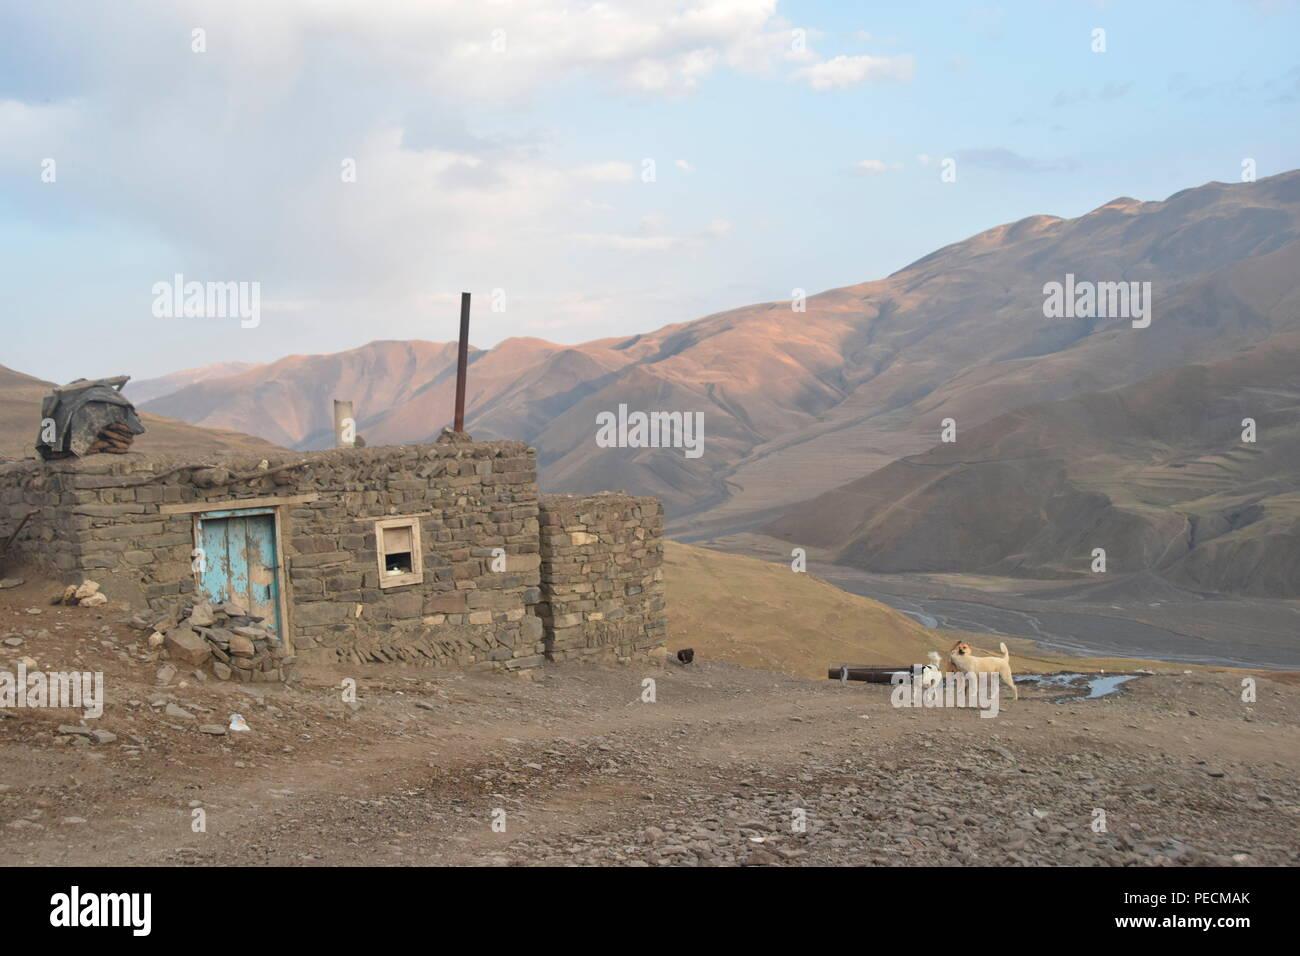 Khinalig, Quba, Aerbaijan - Stock Image